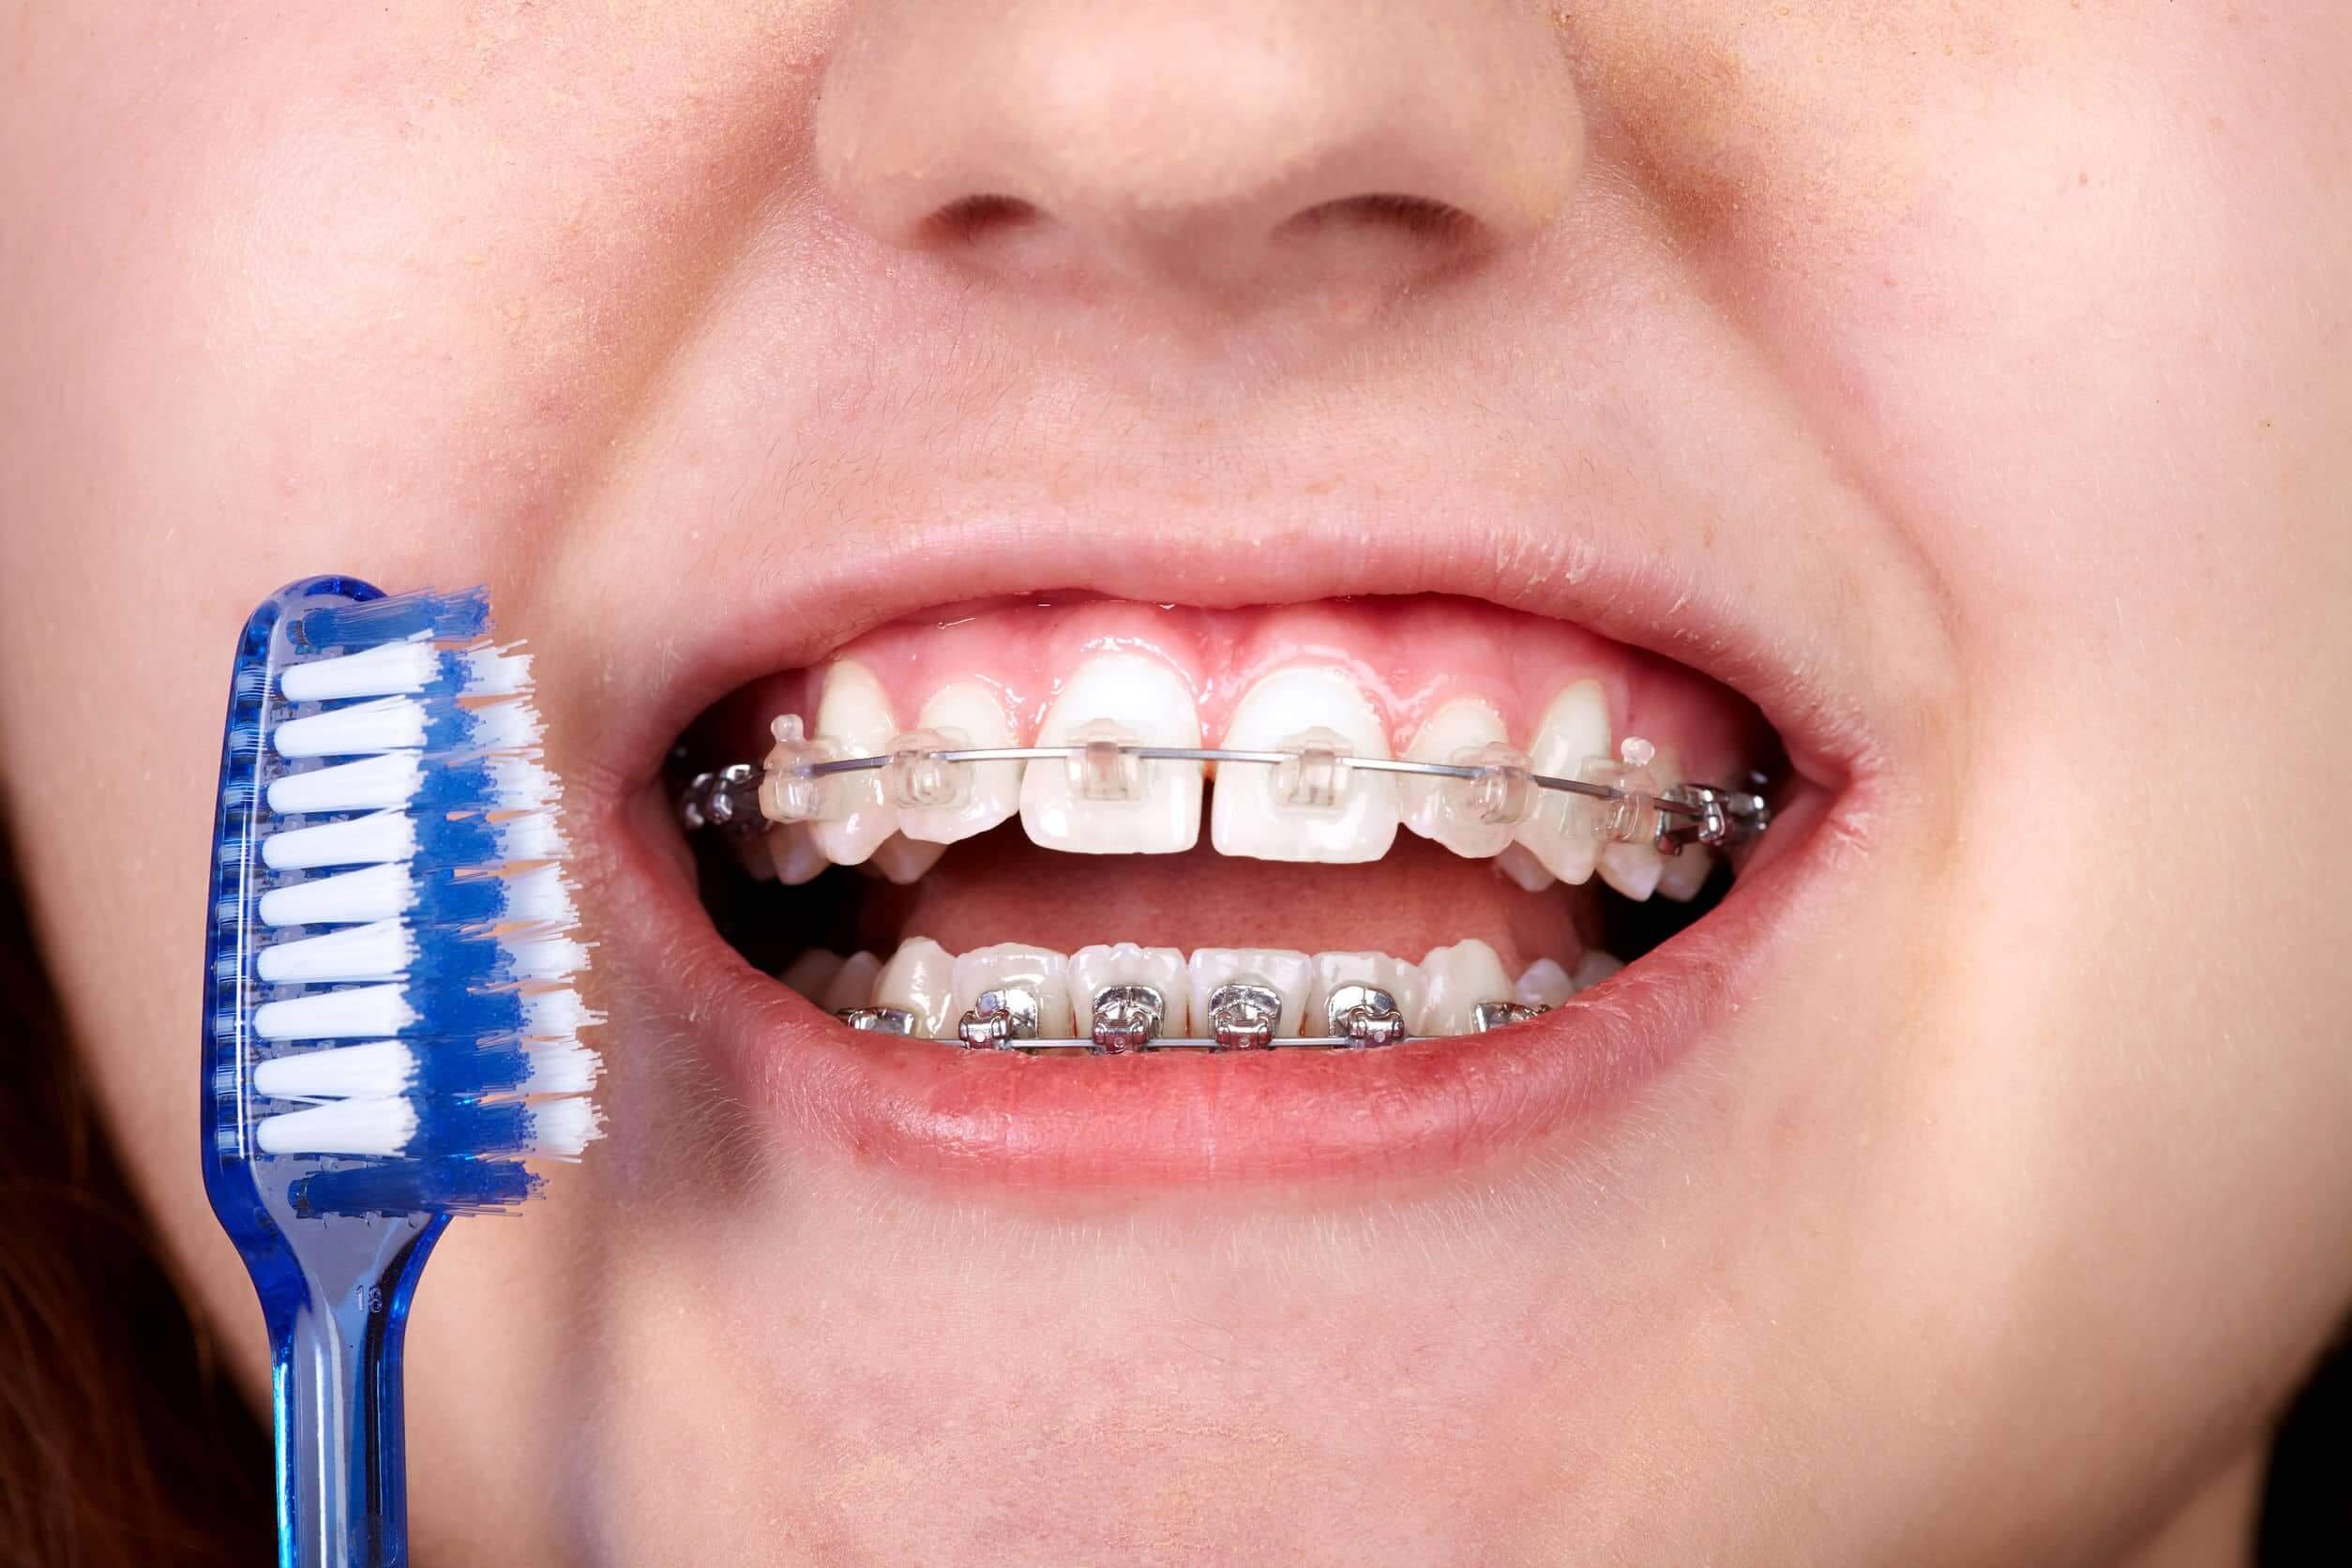 correcta higiene bucal con tratamiento de ortodoncia,